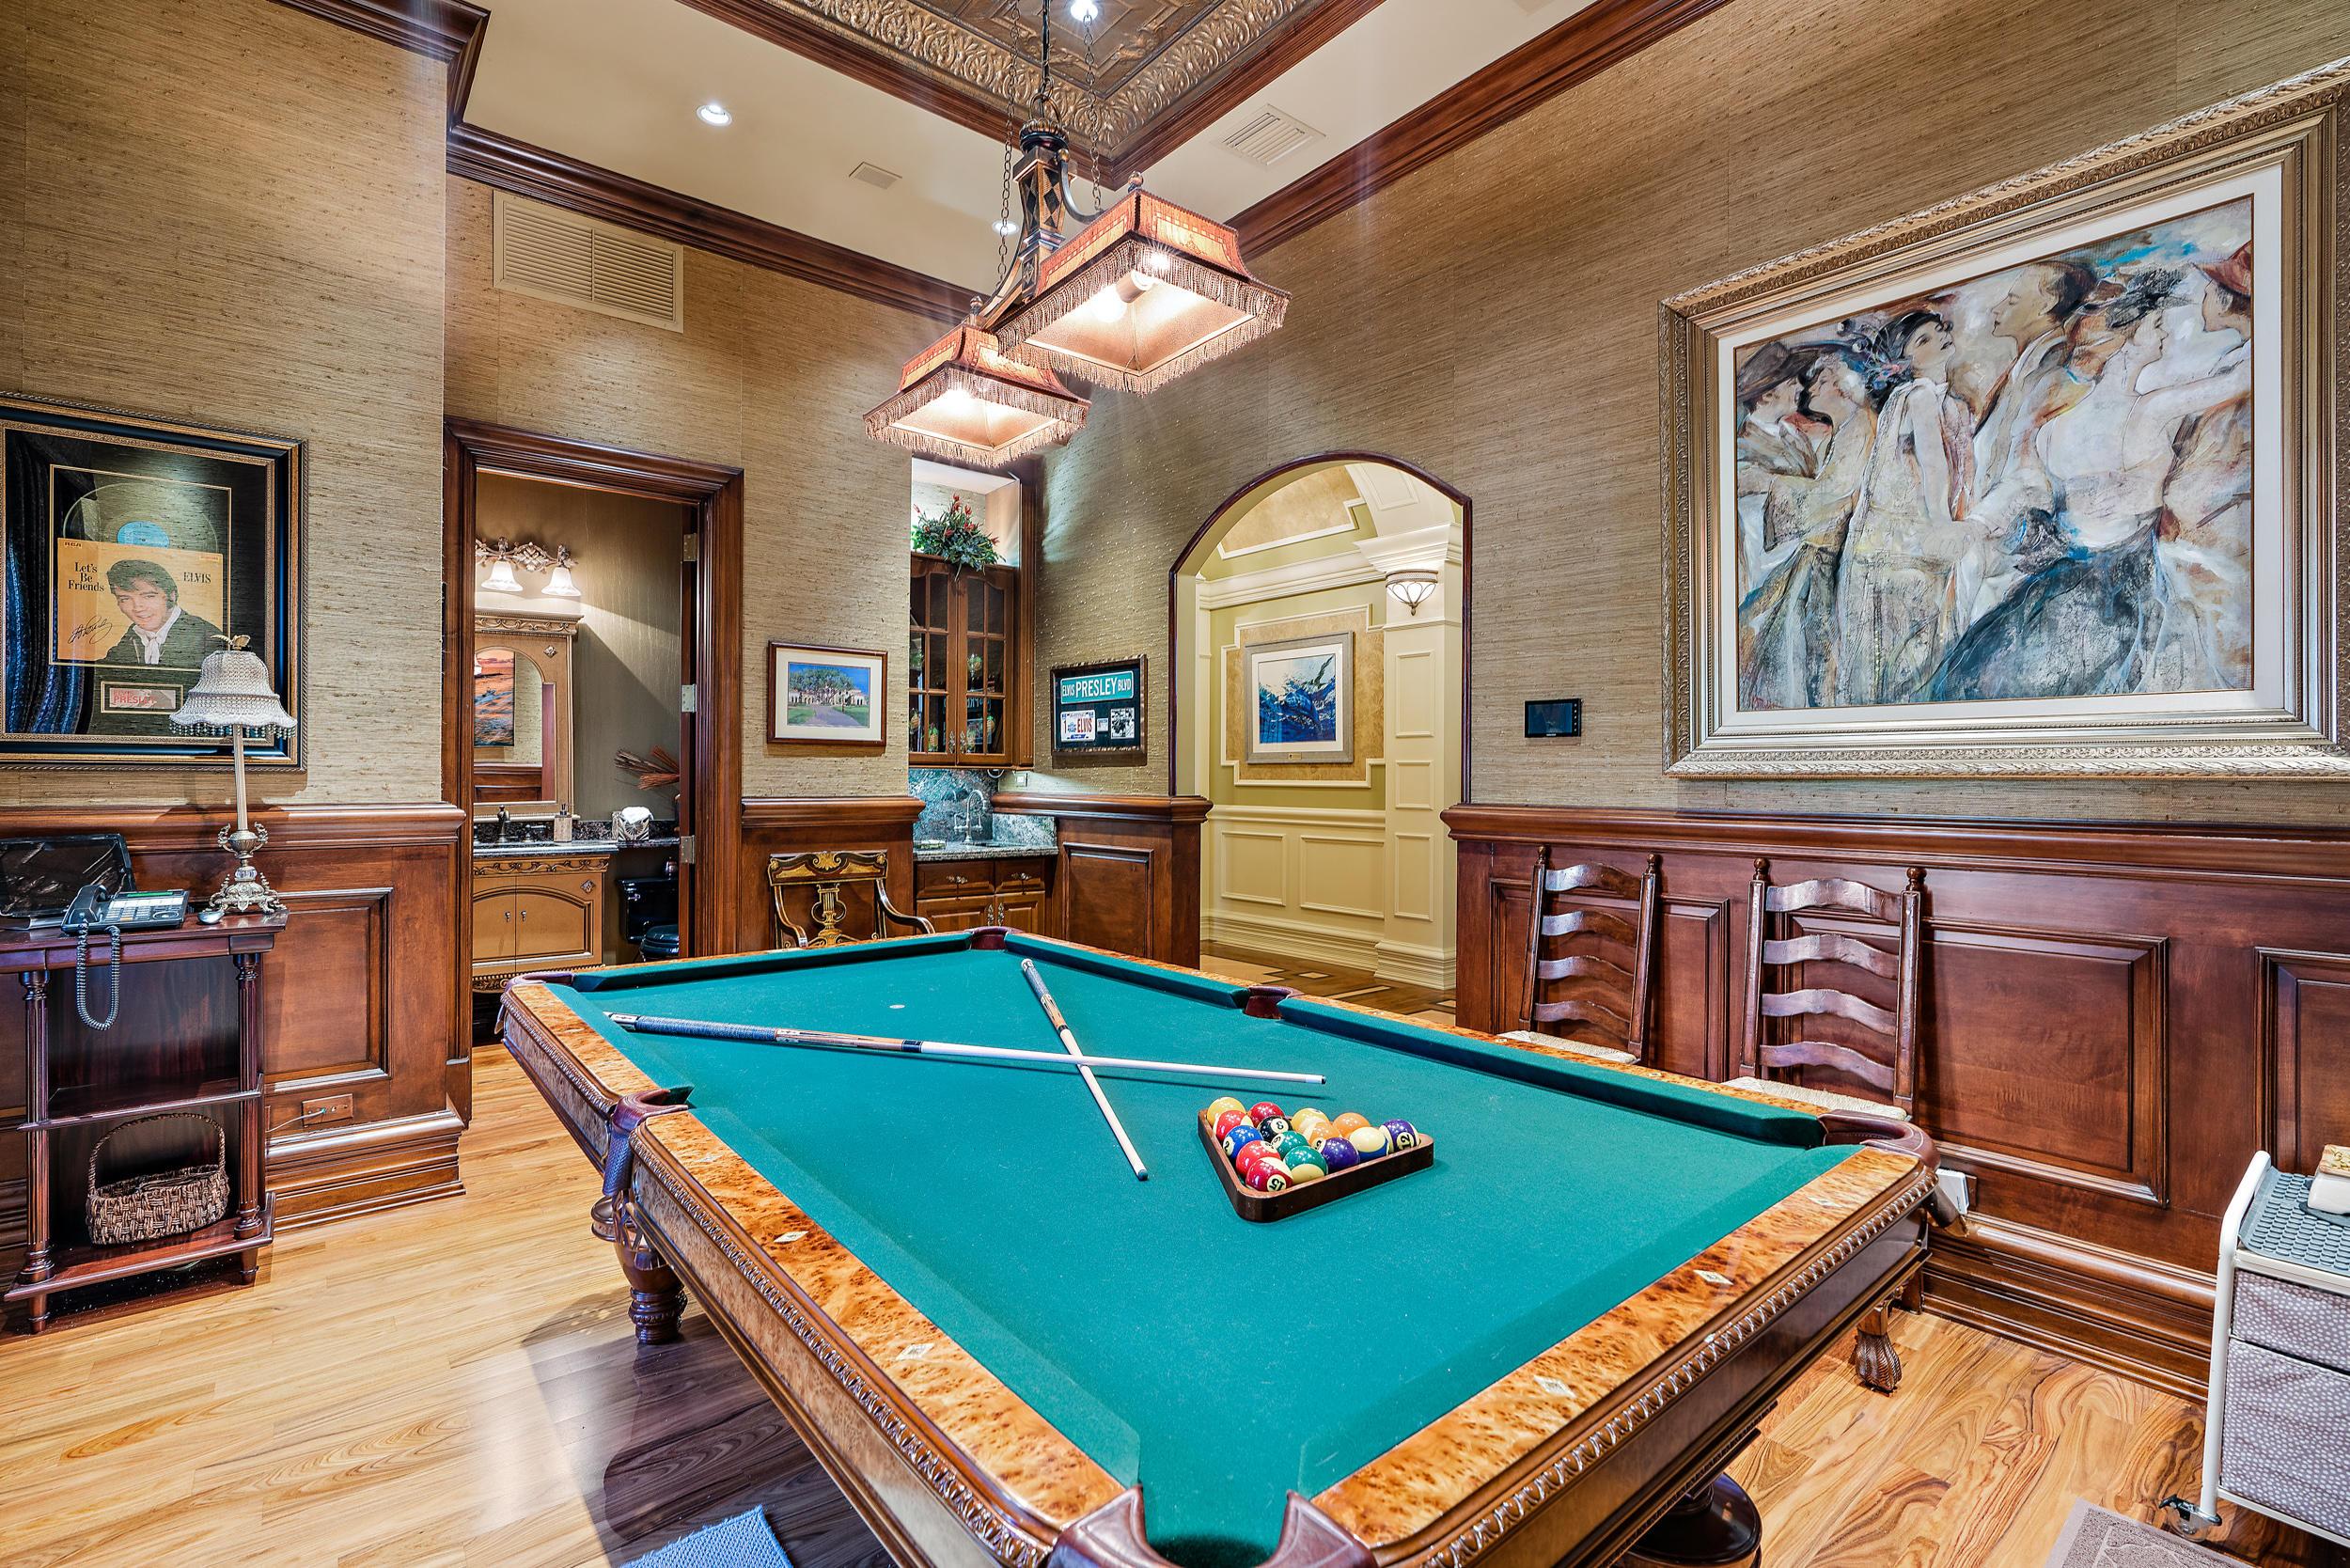 Billiard Room & Wet Bar